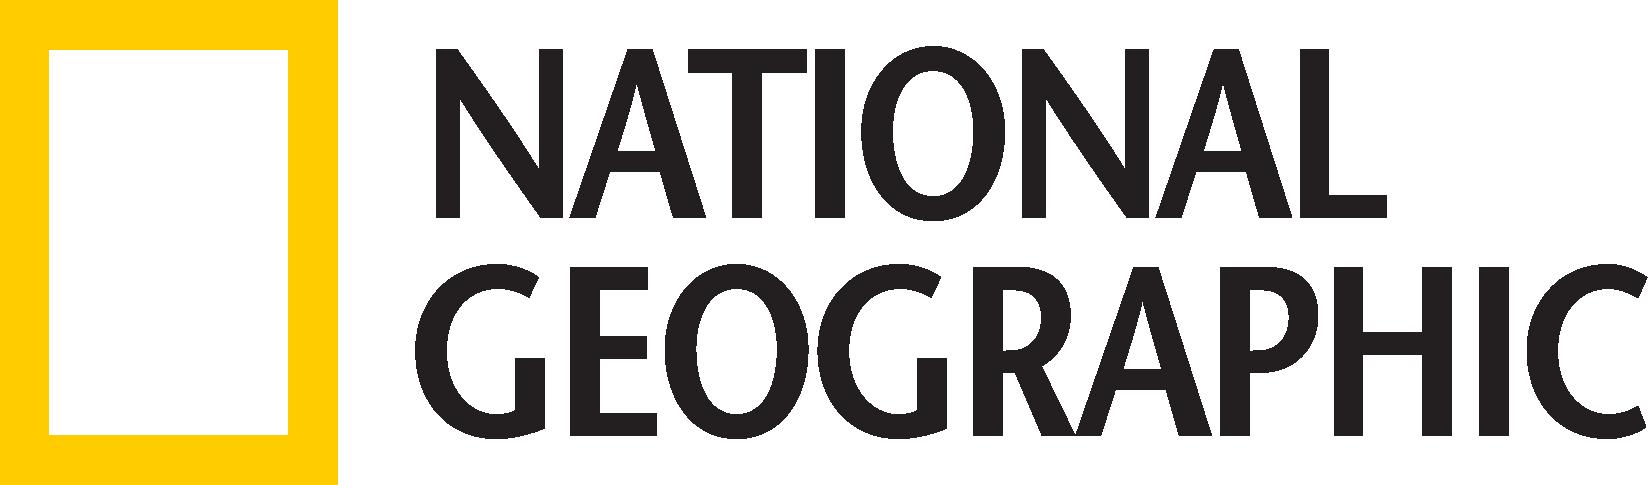 Nat_geo_display_4x.png